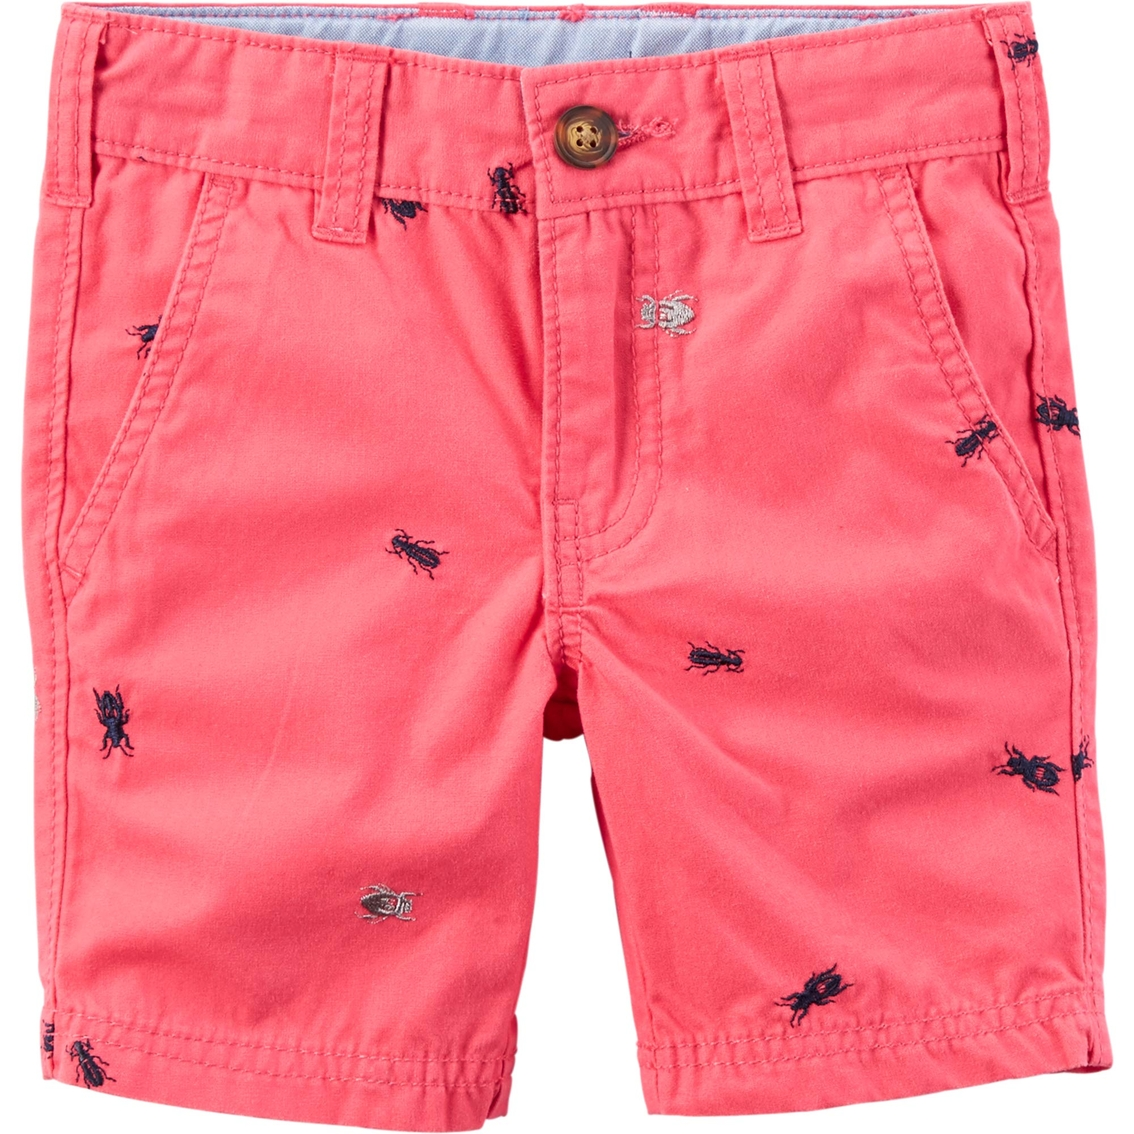 carters little boysboys schiffli twill flat front shorts